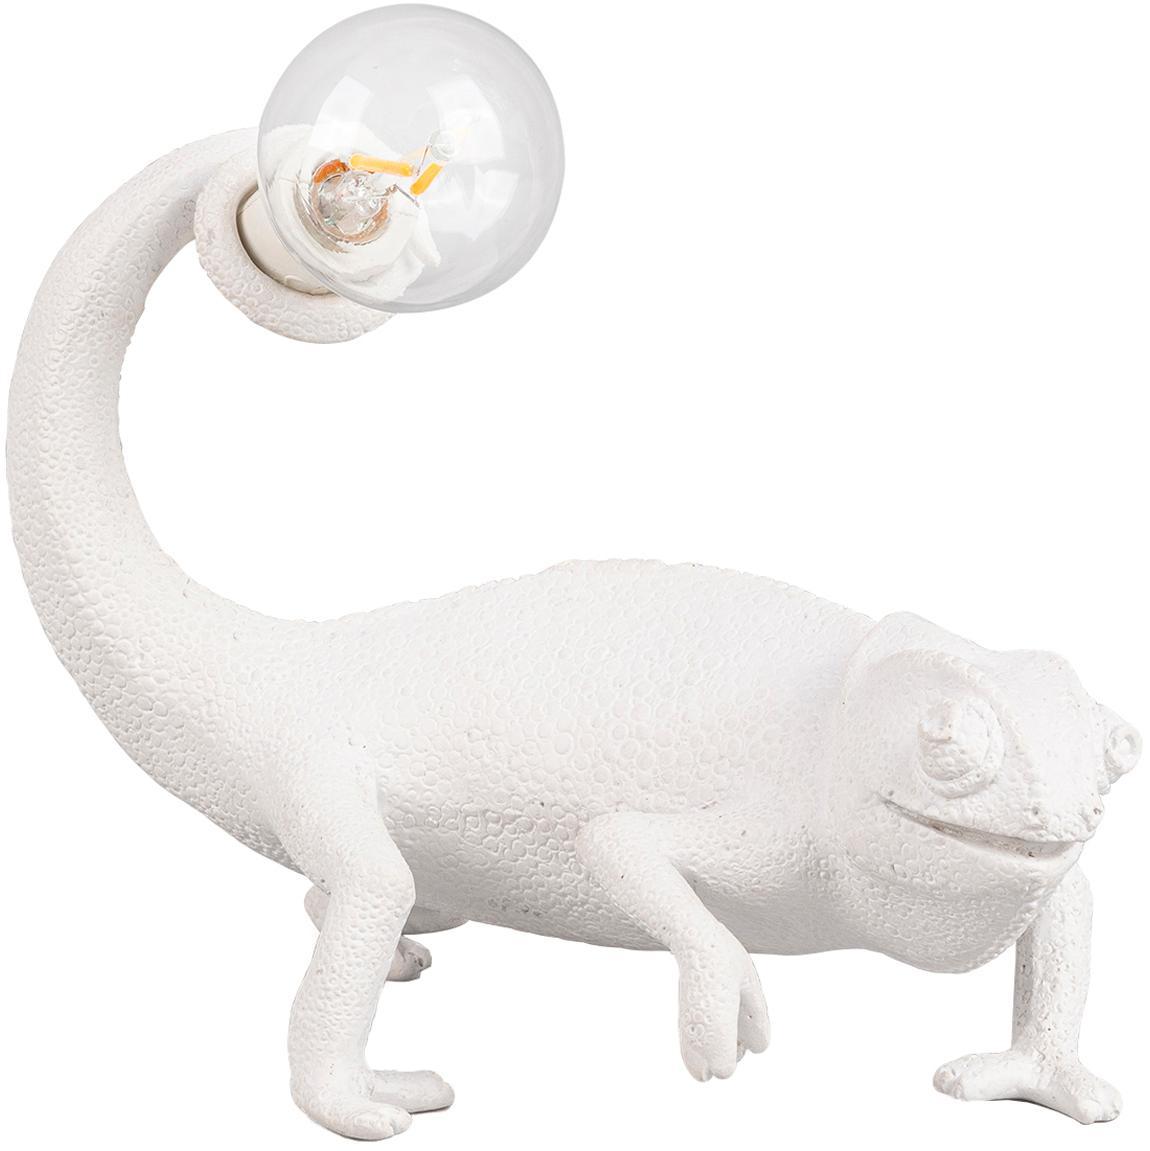 Tafellamp Chameleon, Polyresin, Wit, 17 x 14 cm